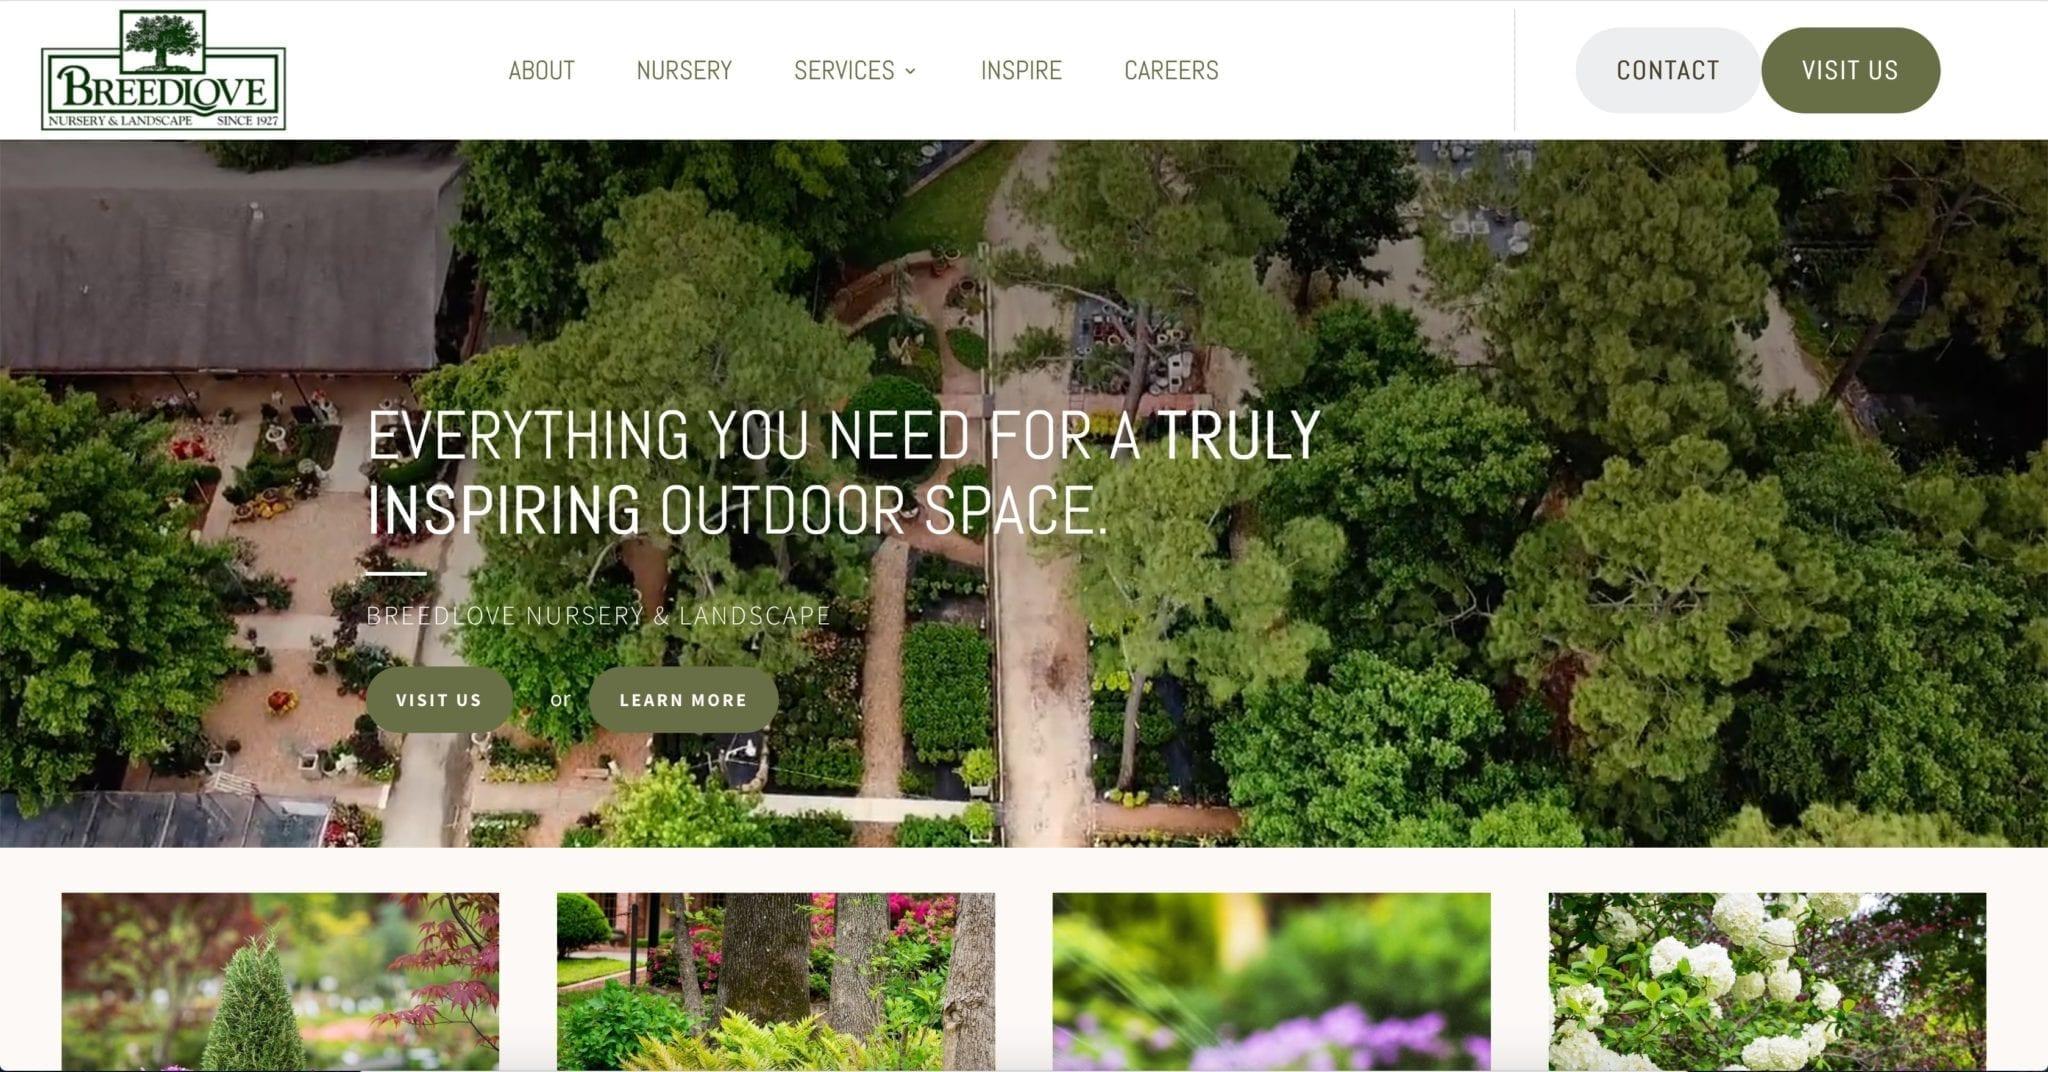 Breedlove Nursery & Landscape Website